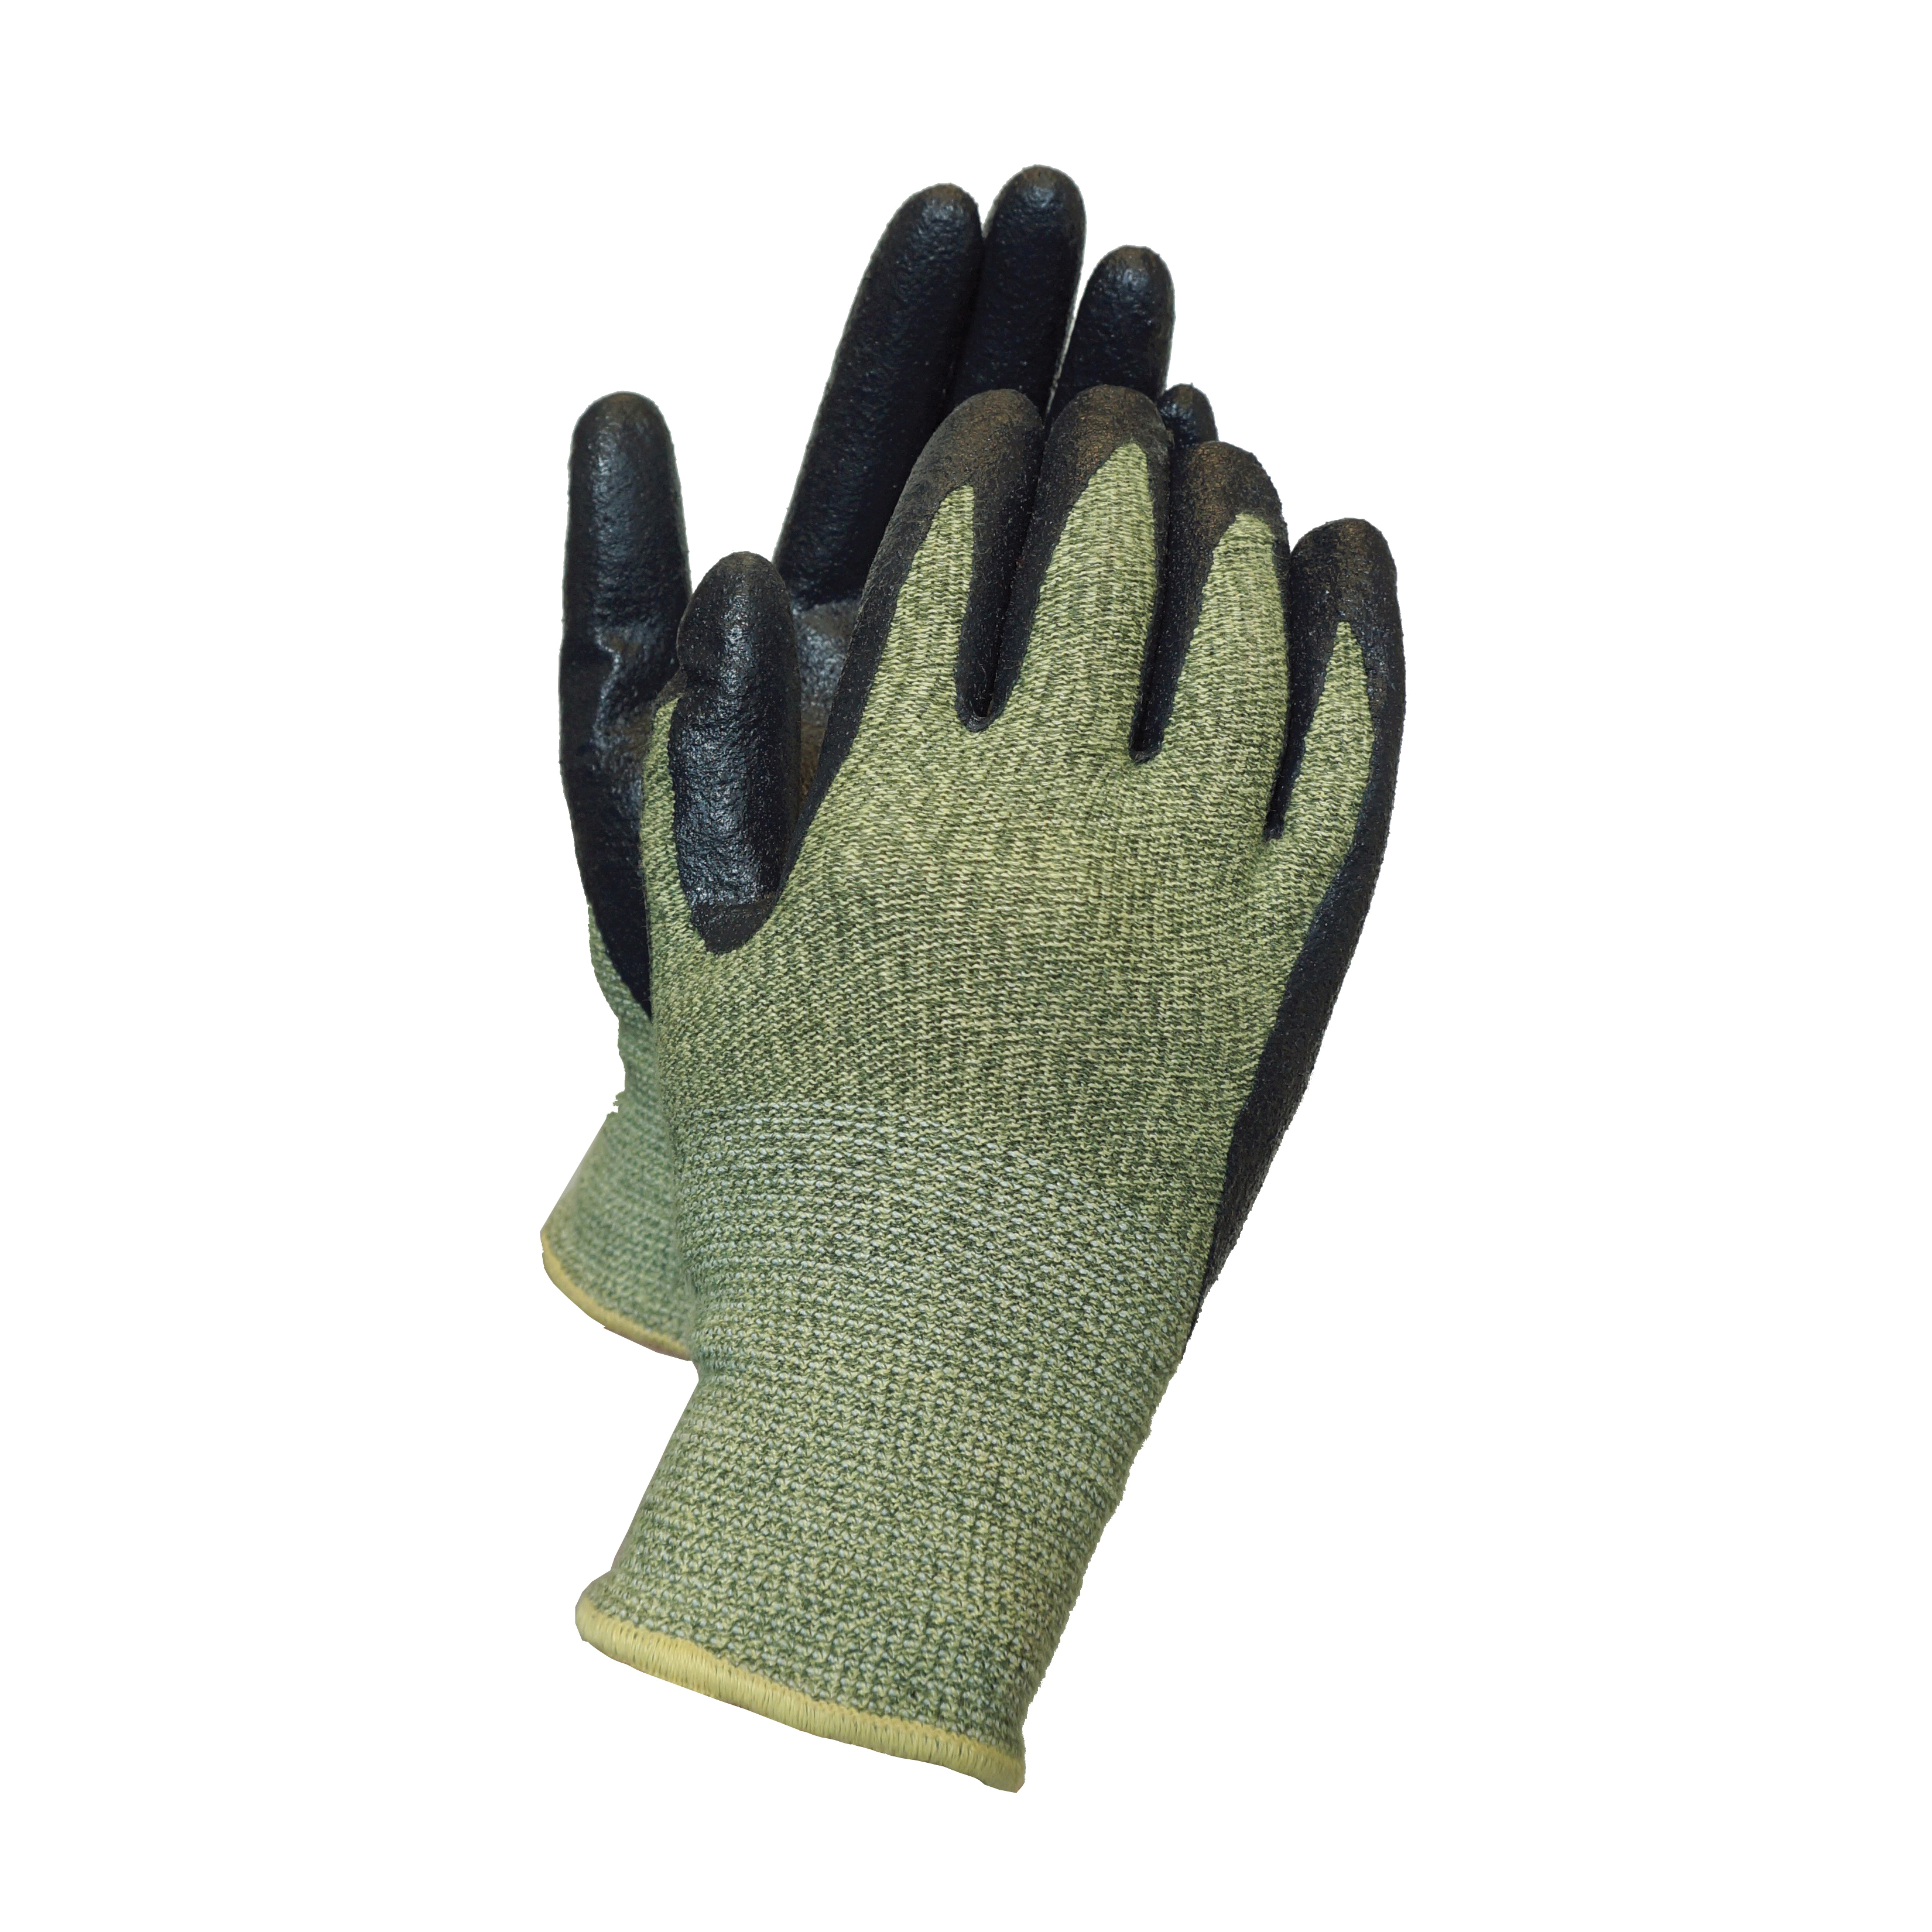 Viking® Firewall FR® 73383-10 Cut-Resistant Gloves, XL/SZ 10, Nitrile Butadiene Rubber Coating, Nitrile Butadiene Rubber, Snug Knit Wrist Cuff, Resists: Abrasion, Cut, Dirt, Debris, Flame, Puncture and Tear, ANSI Cut-Resistance Level: A4